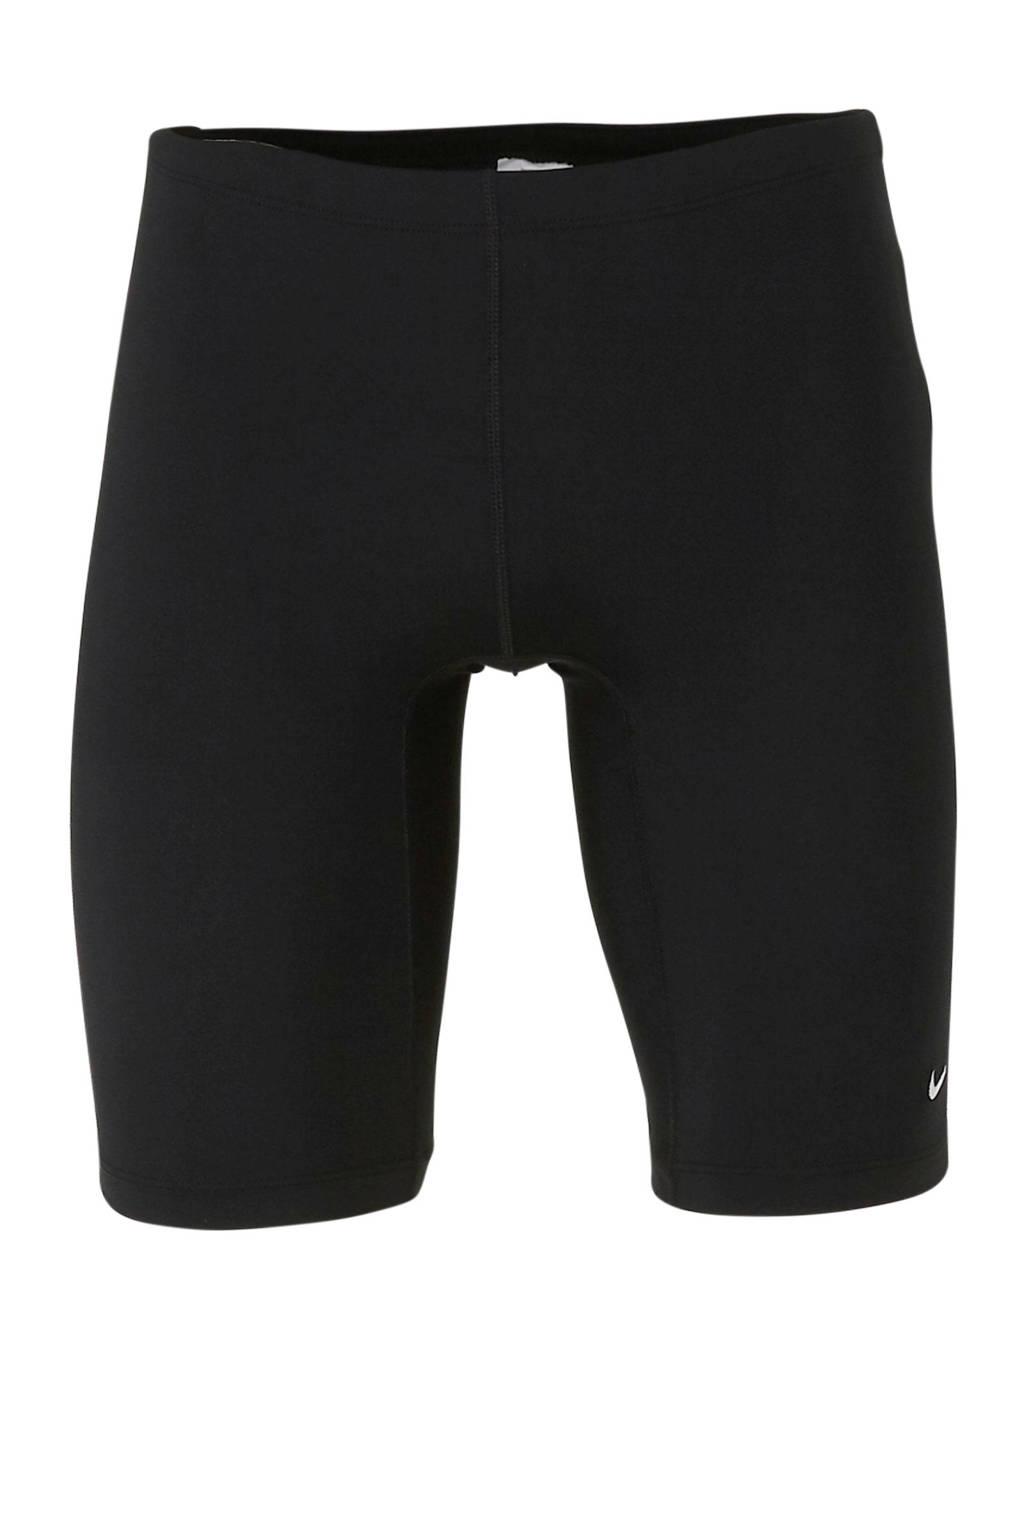 Nike jammer zwart, Zwart